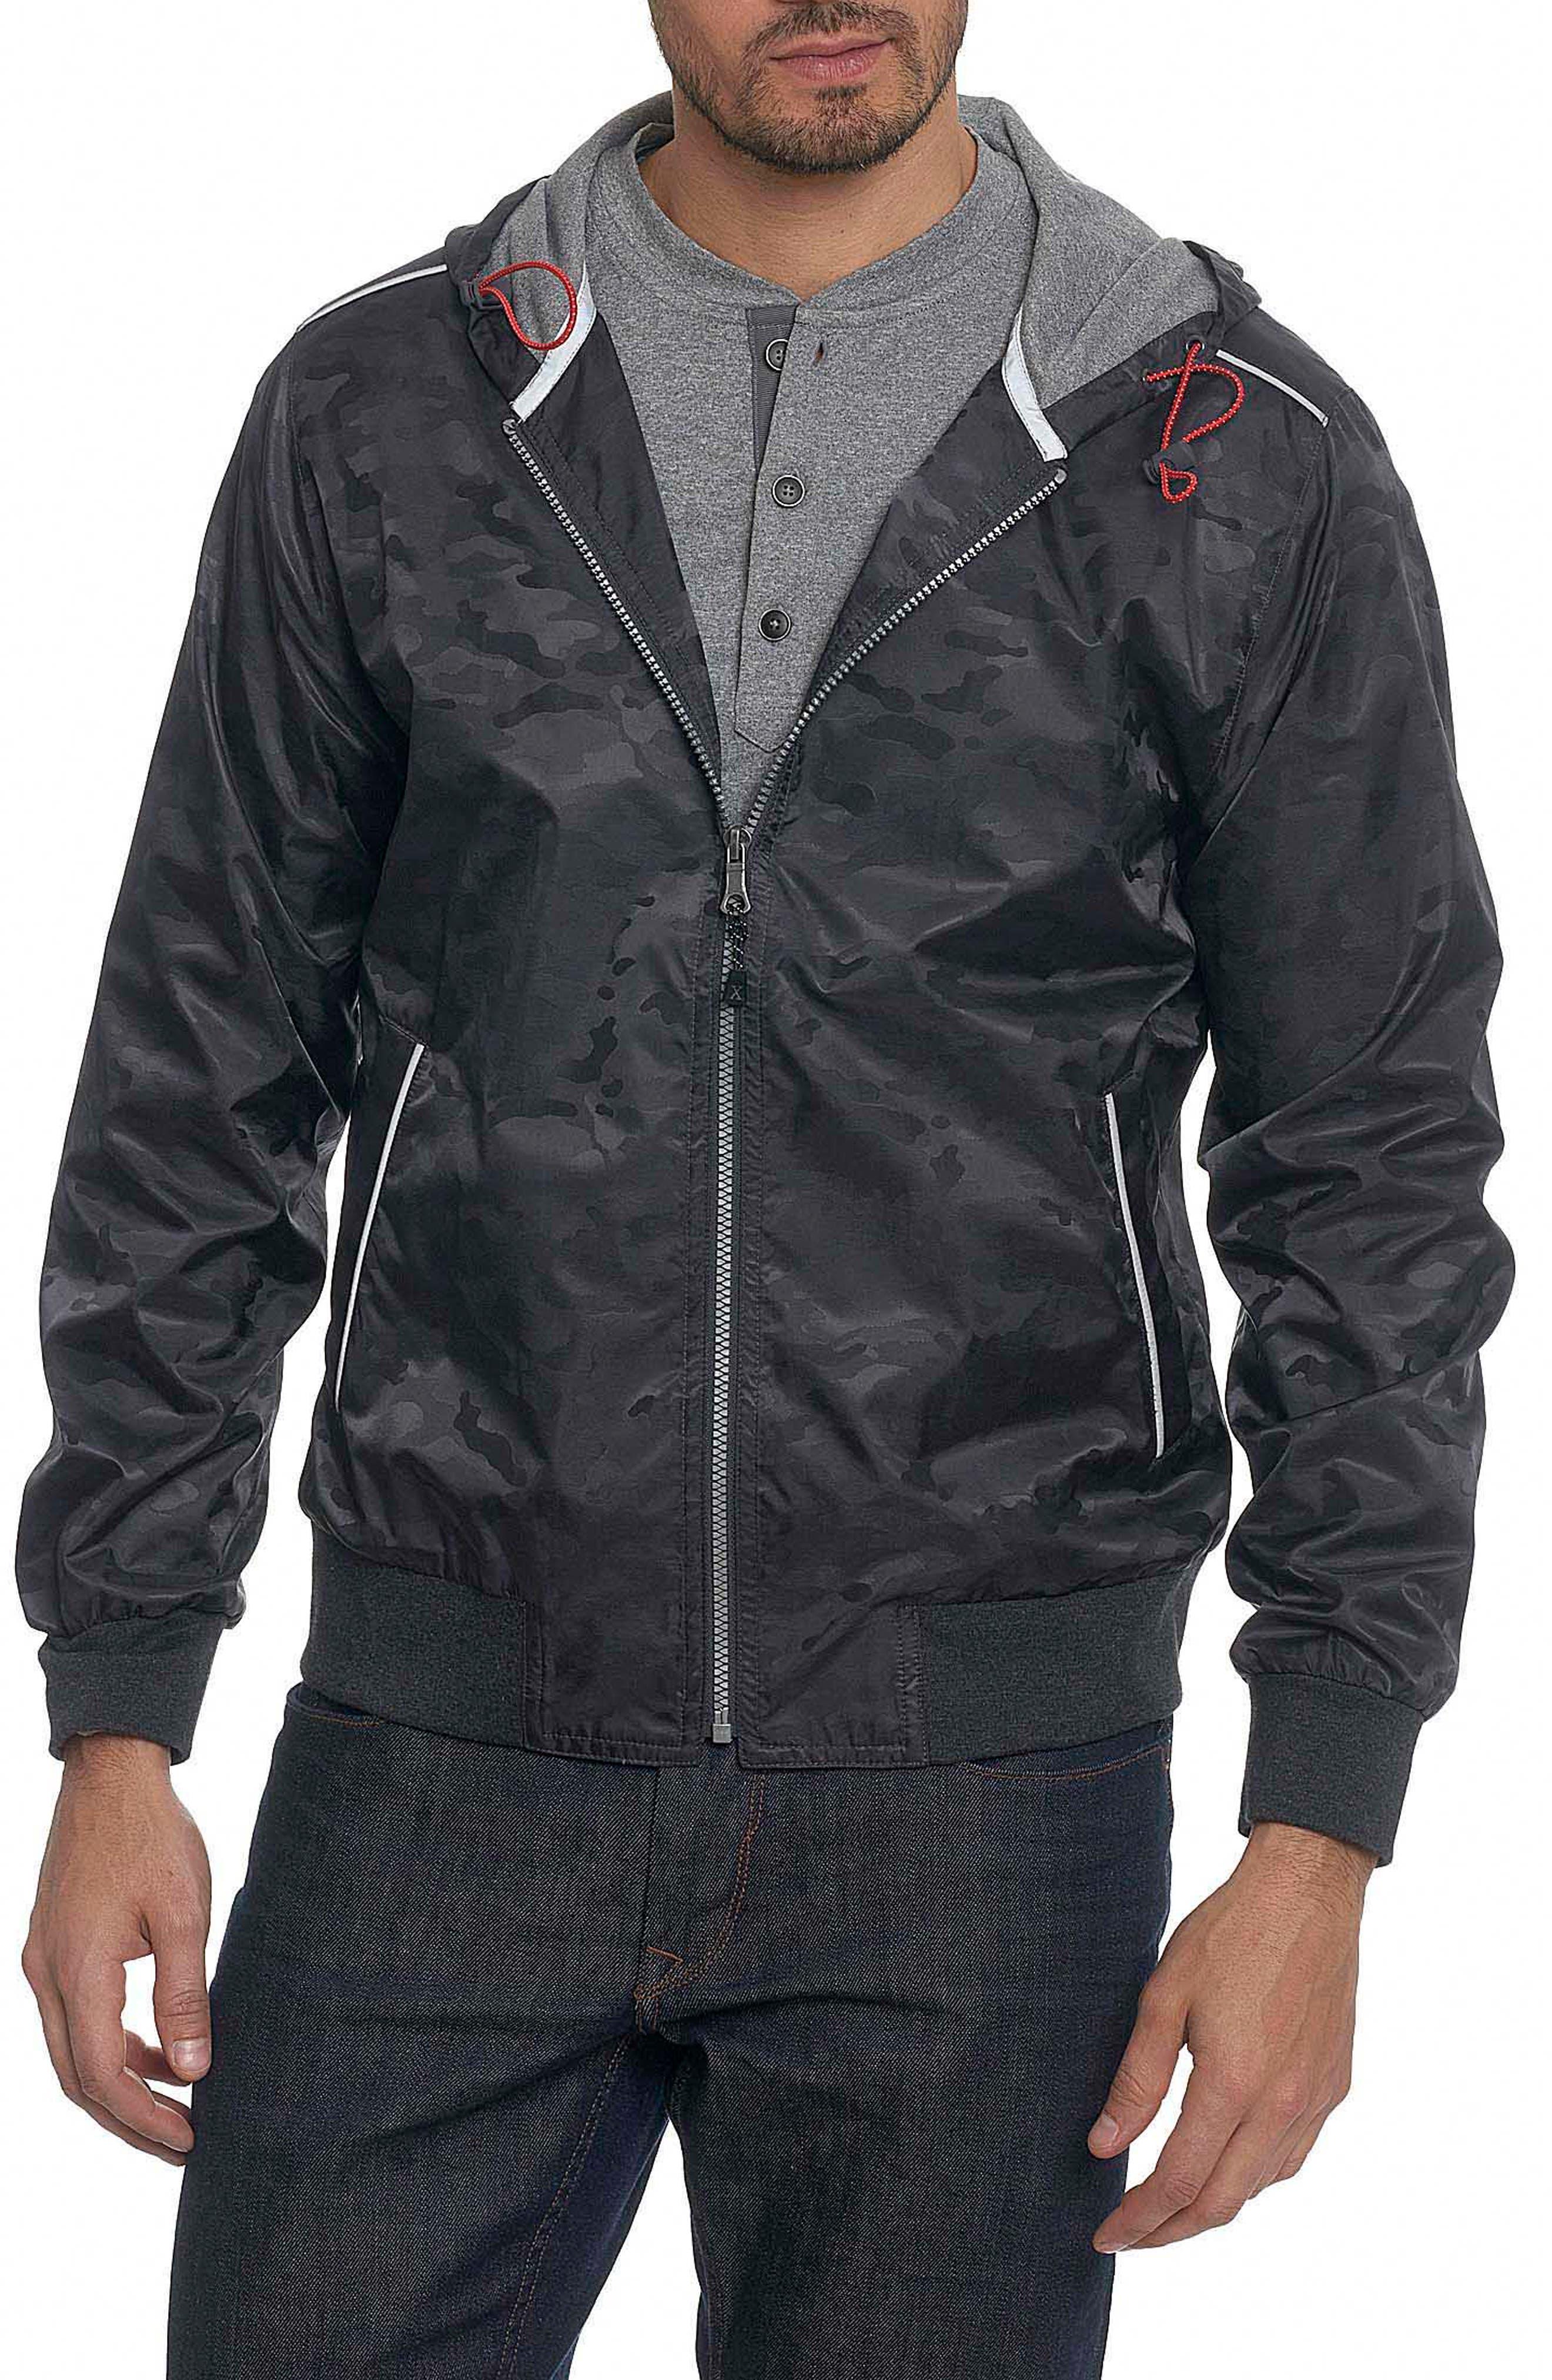 Peekskill Tailored Fit Jacket,                             Main thumbnail 1, color,                             060